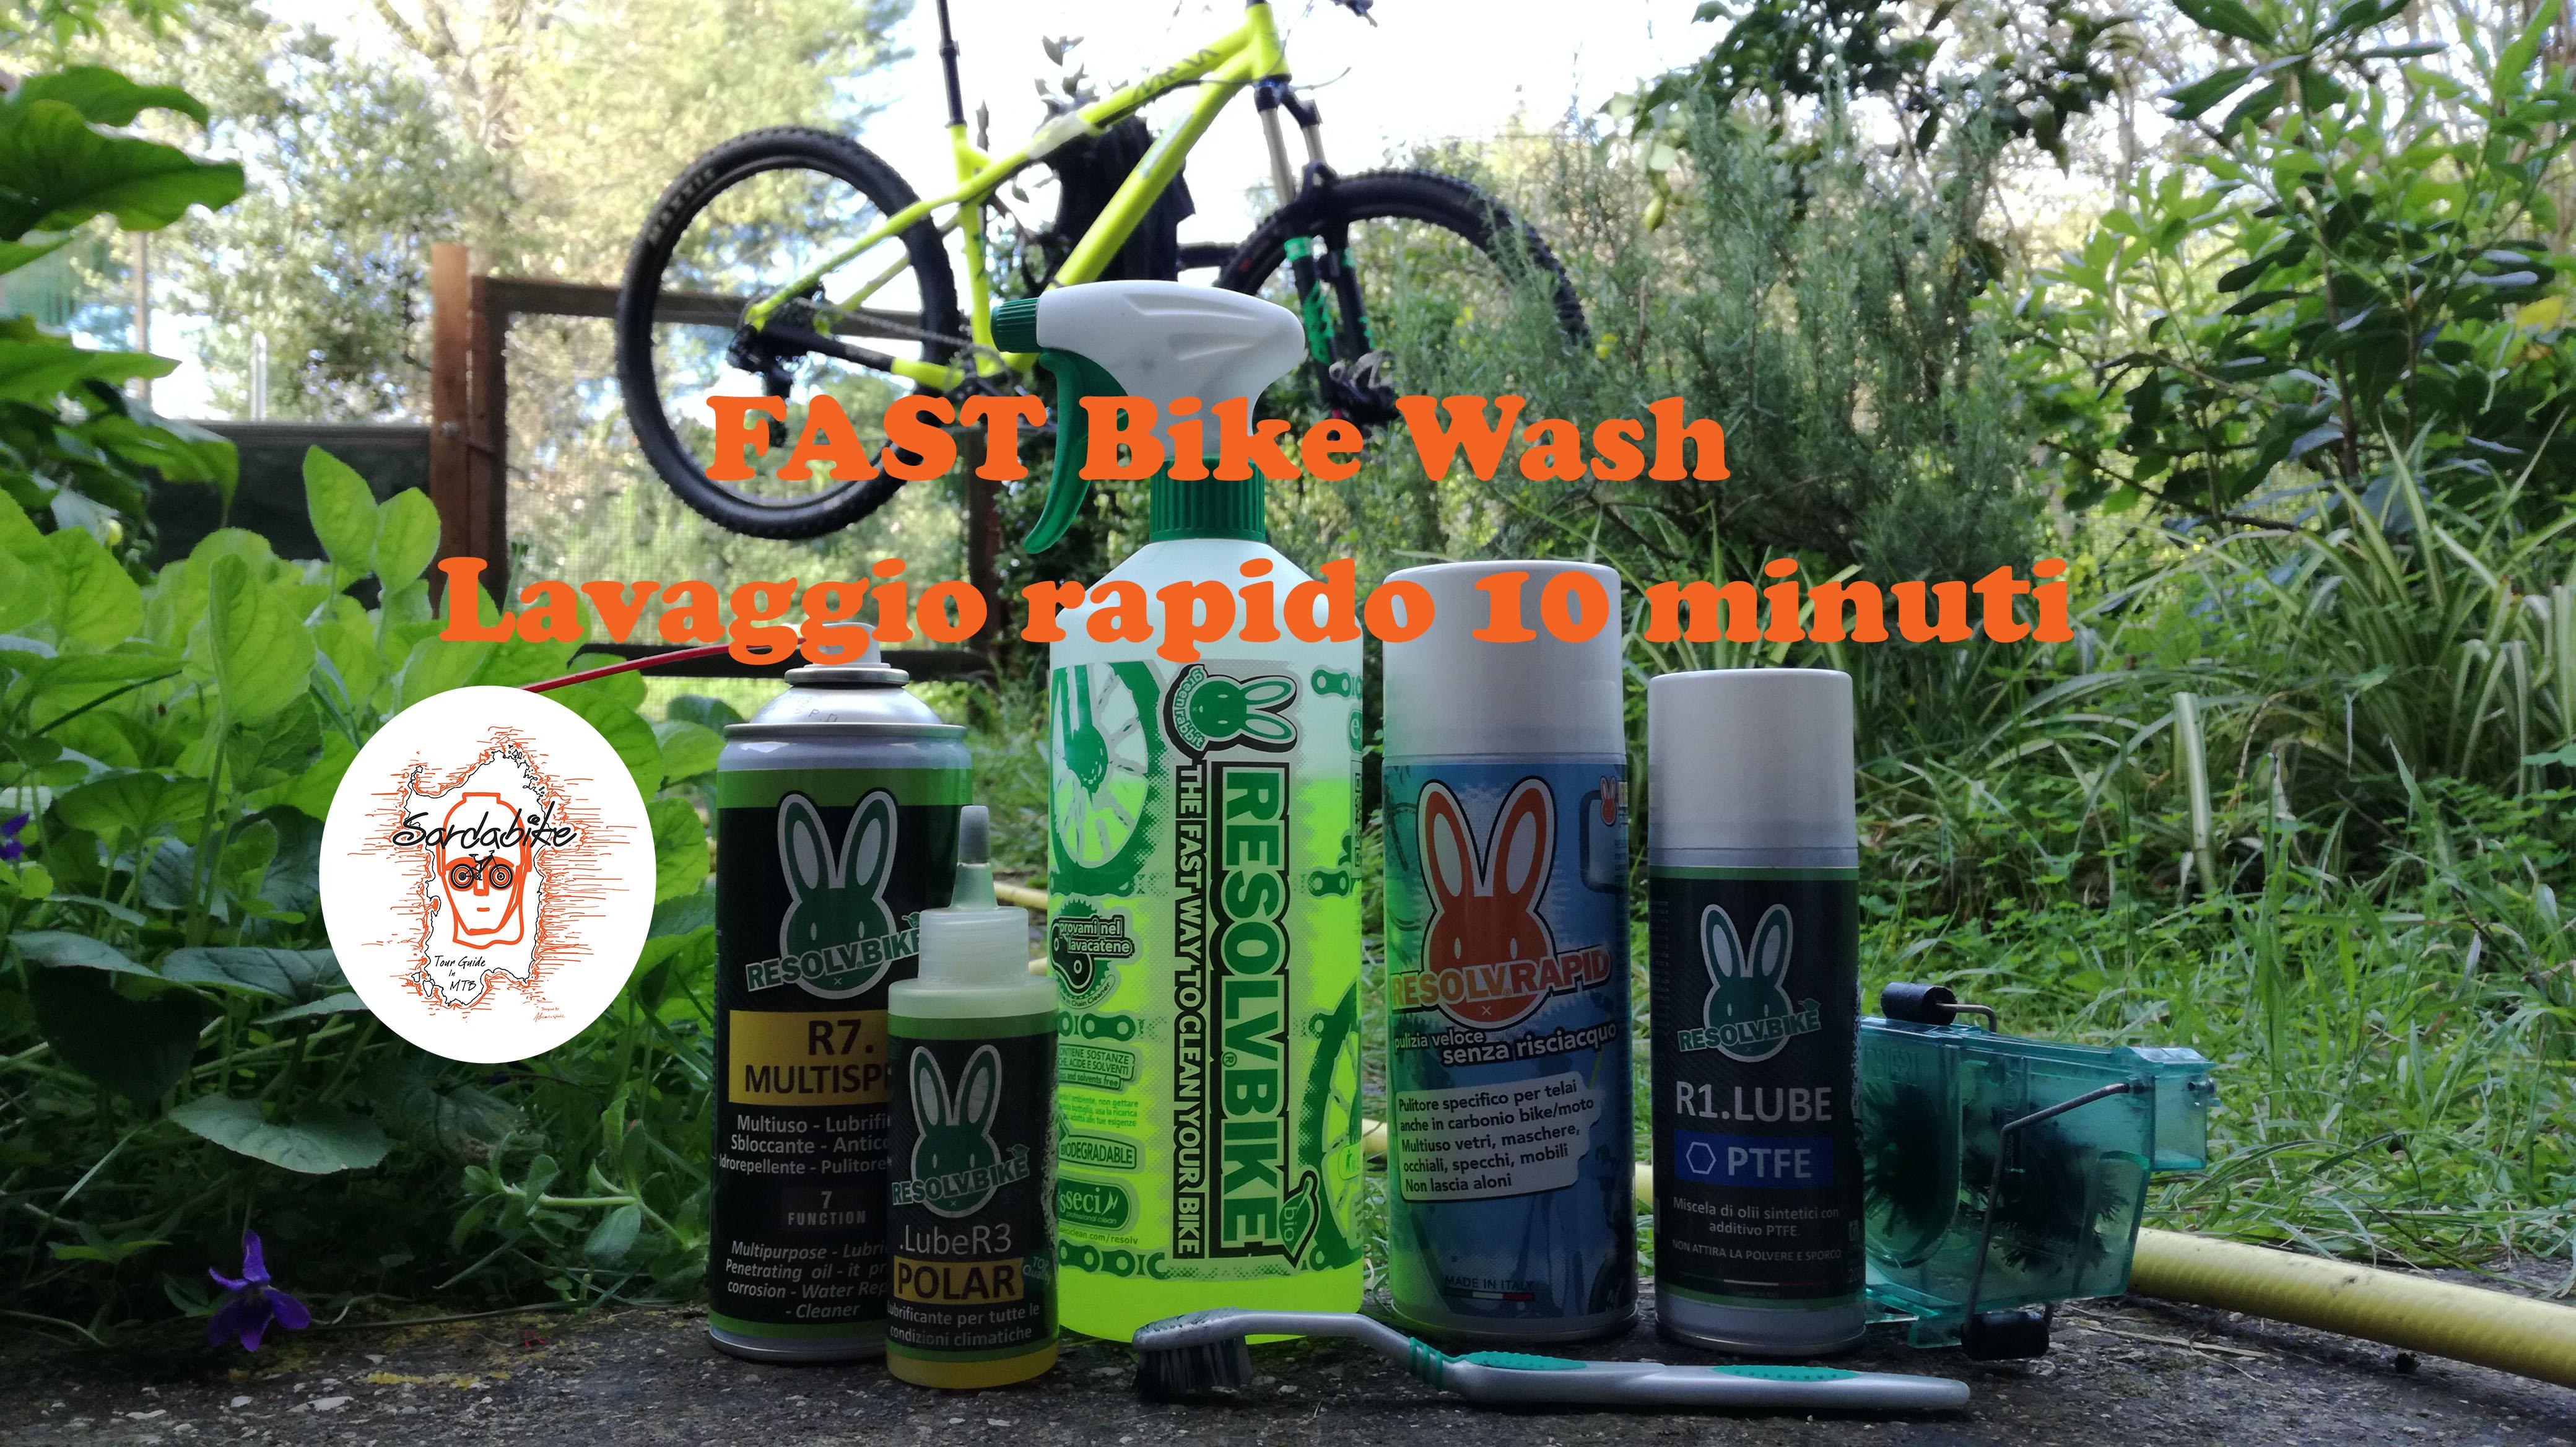 sardabike mtb resolvbike fast wash lavaggio rapido mountain bike